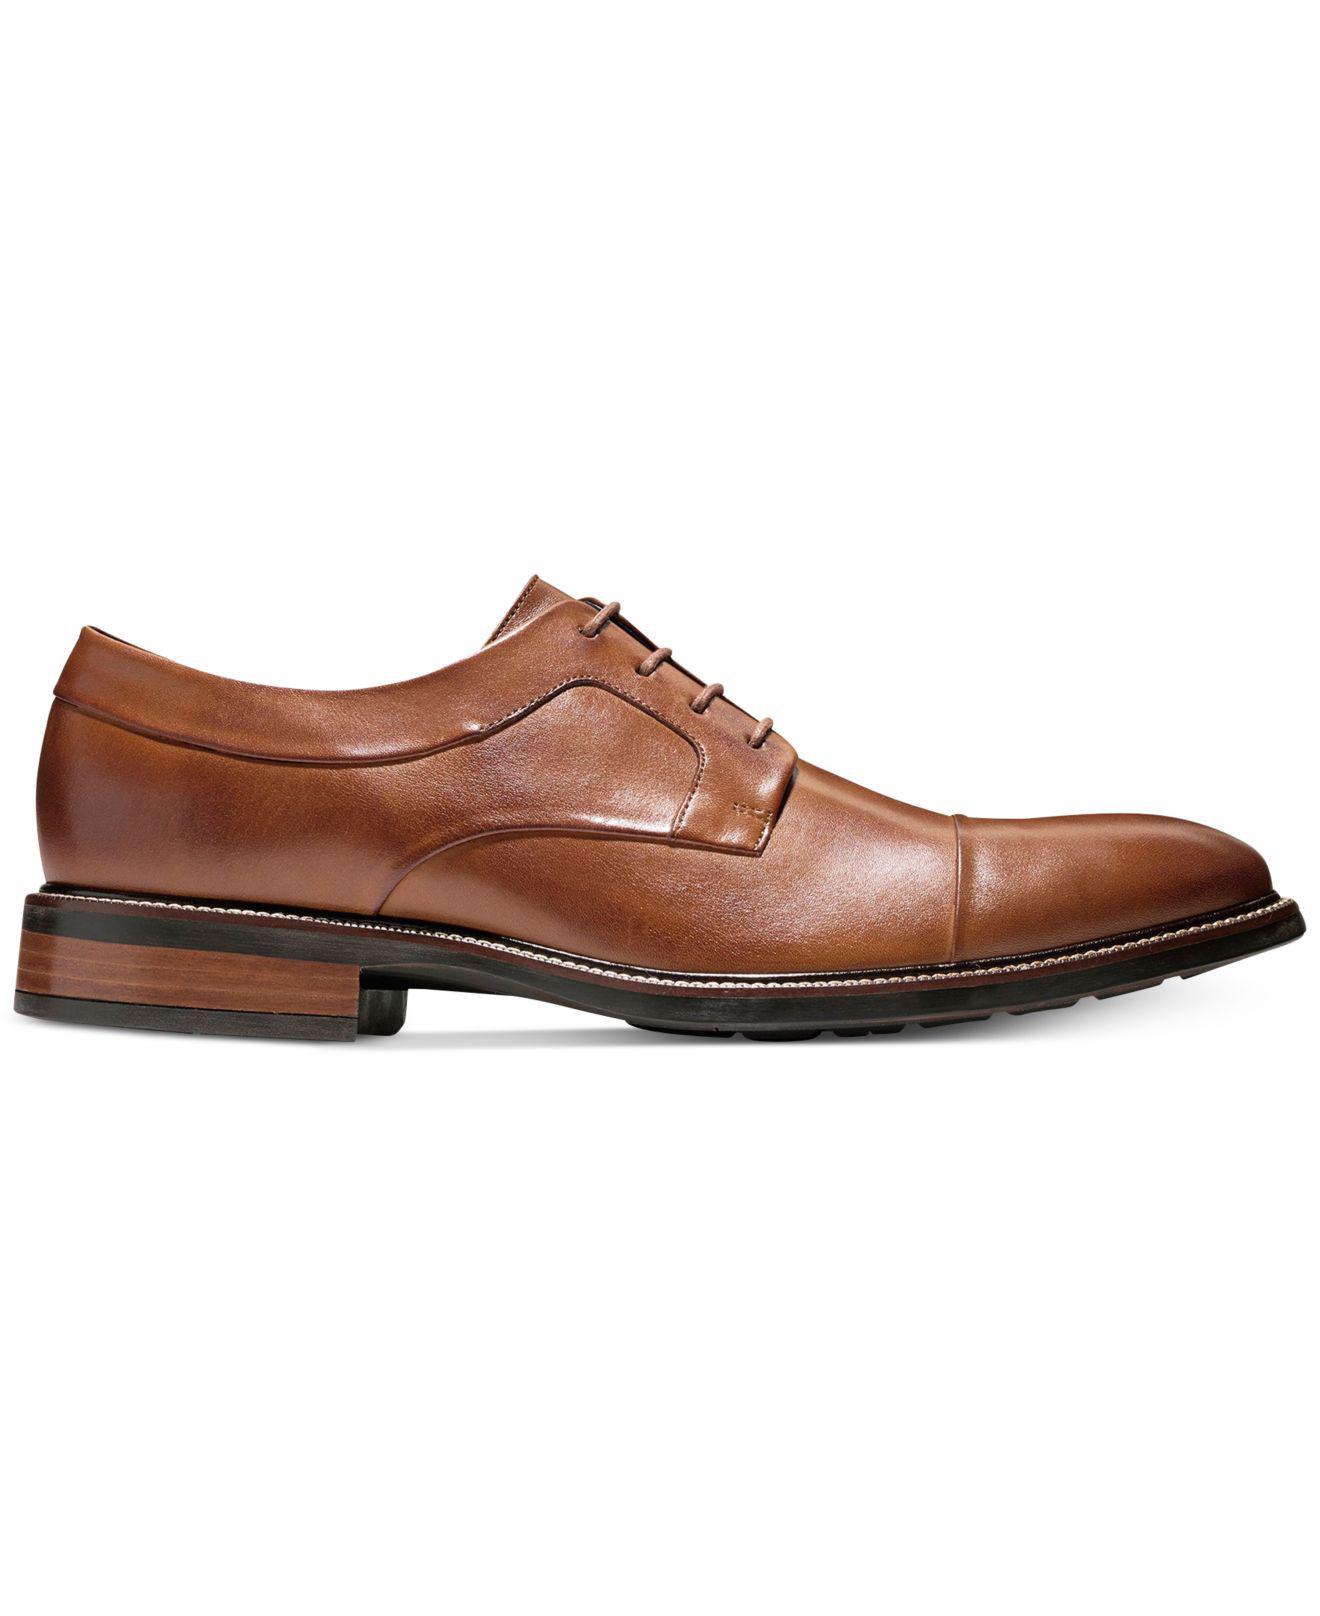 751b3a159b6 Lyst - Cole Haan Men s Hartsfield Cap-toe Oxfords in Brown for Men